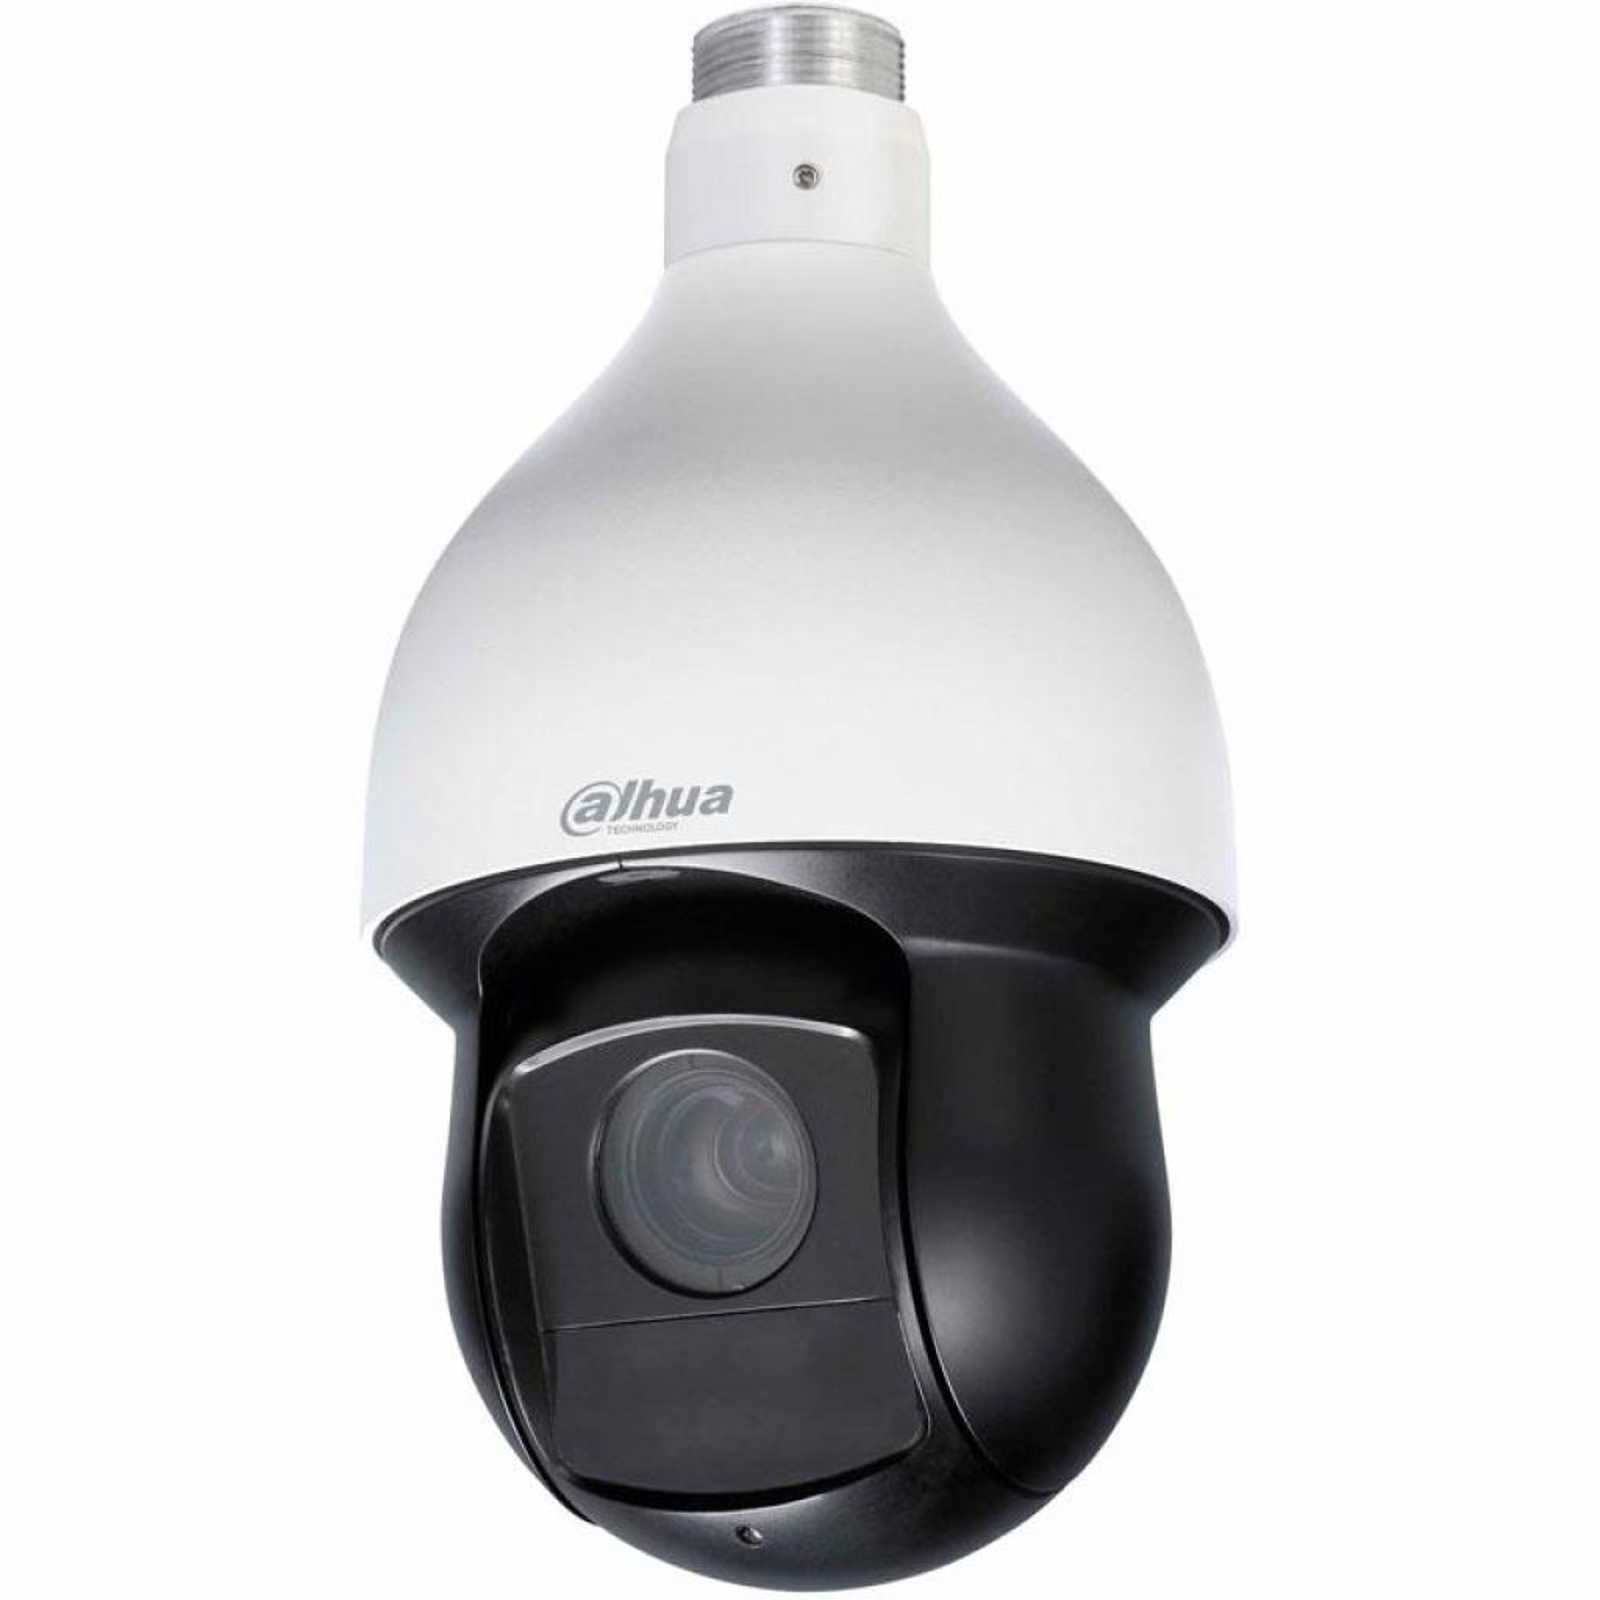 Камера видеонаблюдения Dahua DH-SD59225I-HC-S3 (PTZ 25x) (04416-05669)